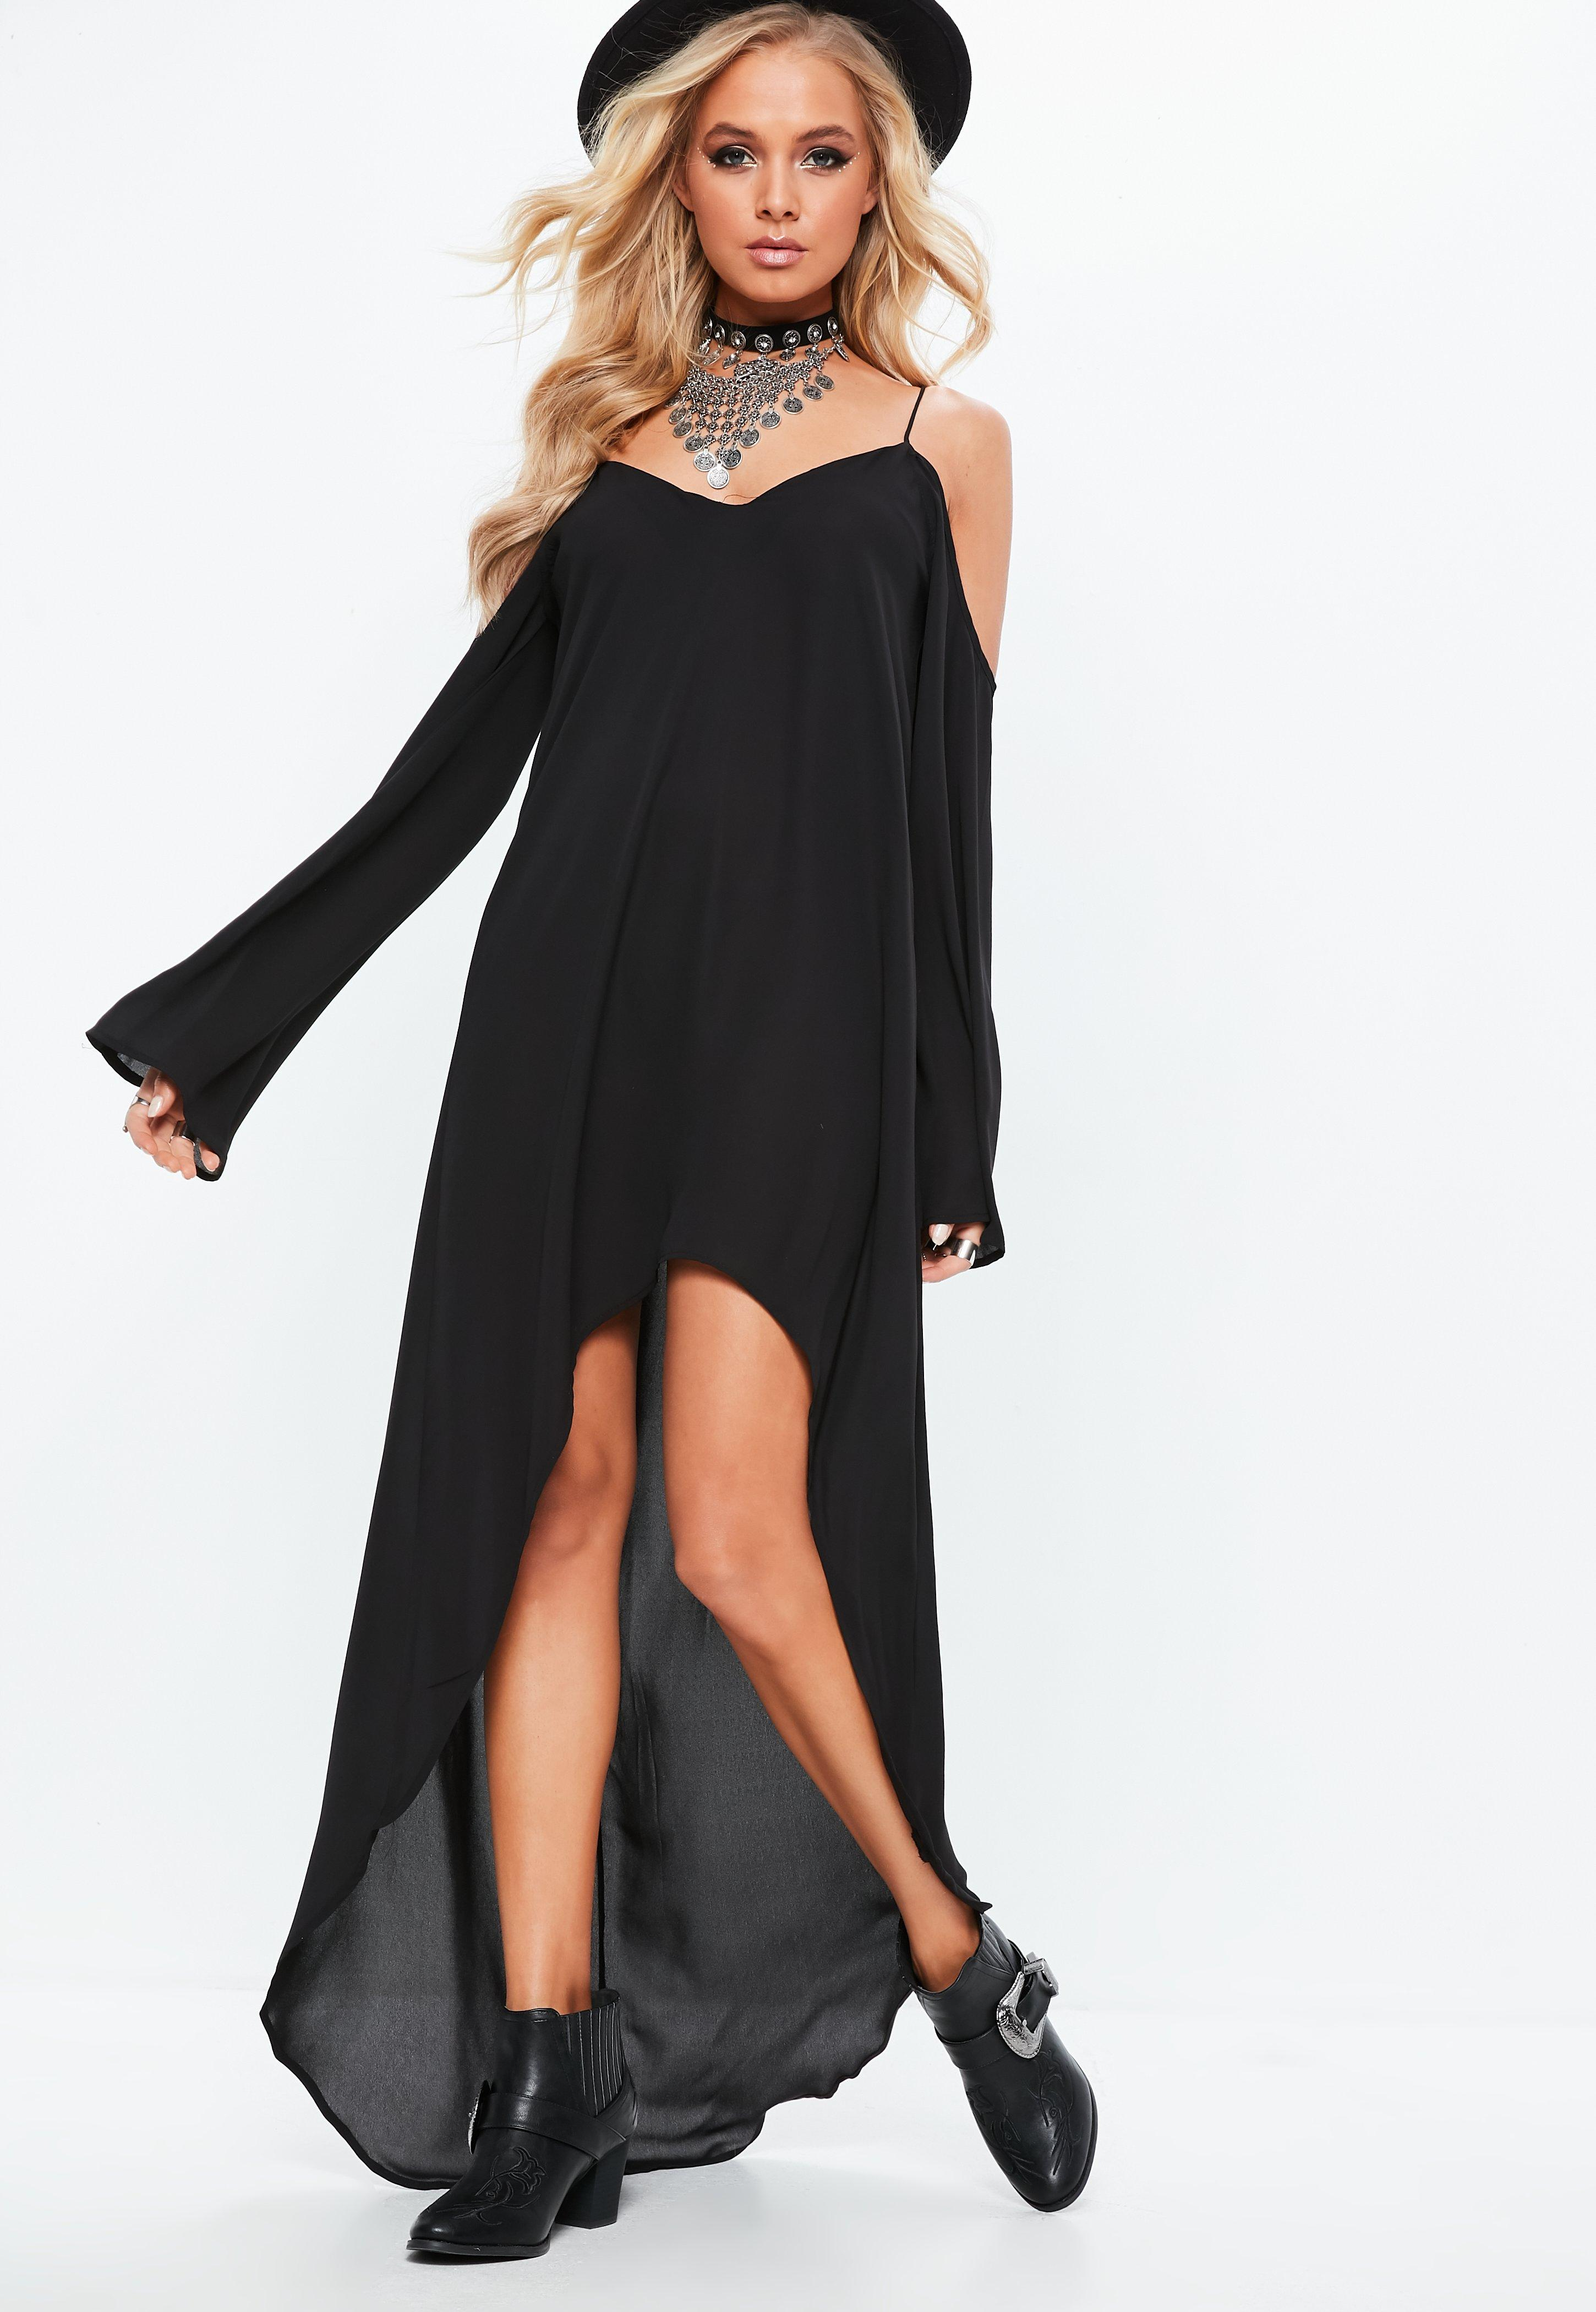 Schwarzes kleid langarm transparent